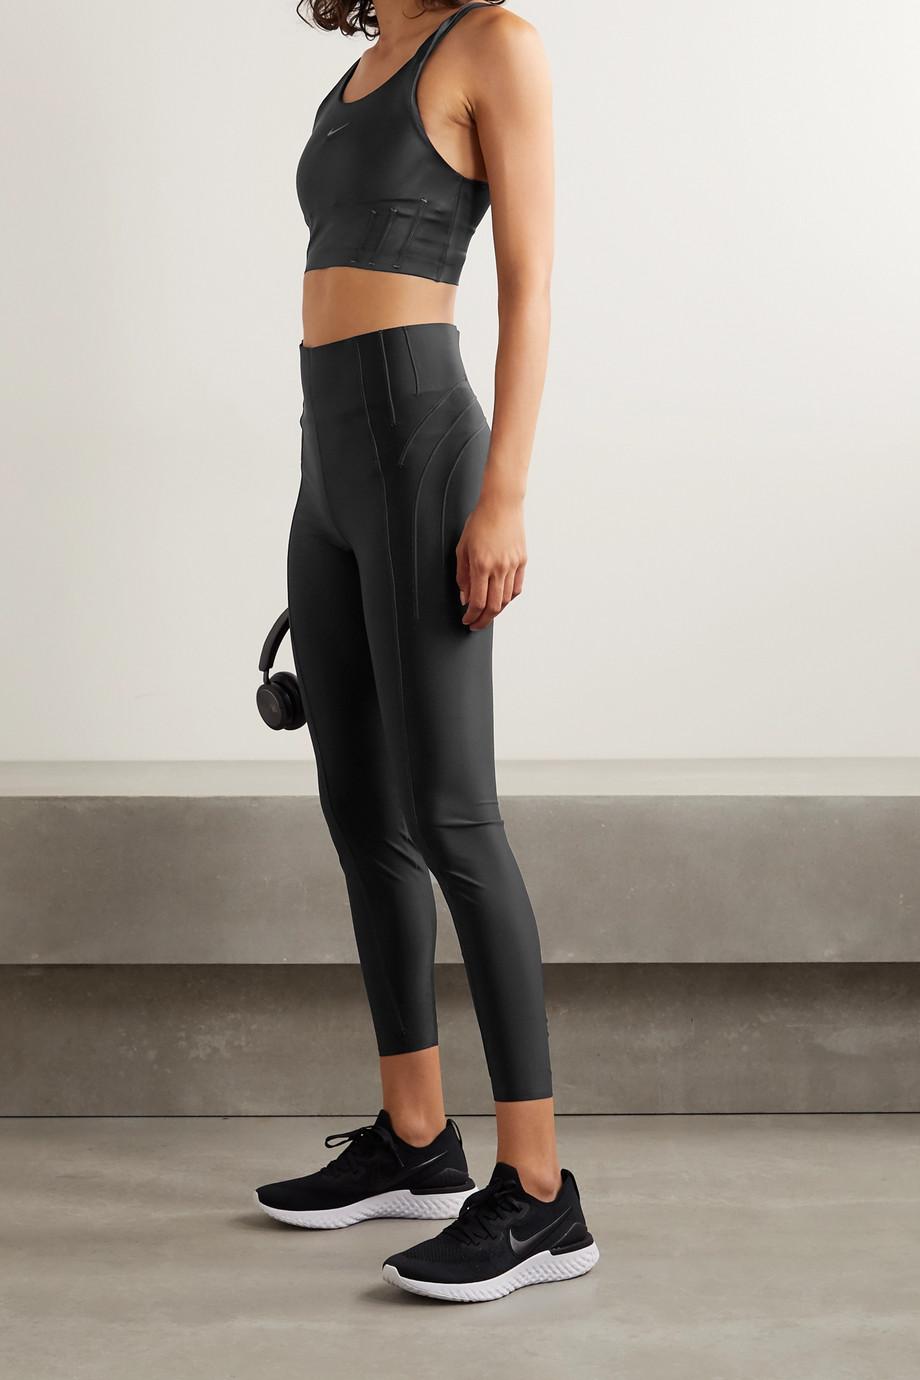 Nike City Ready coated stretch leggings